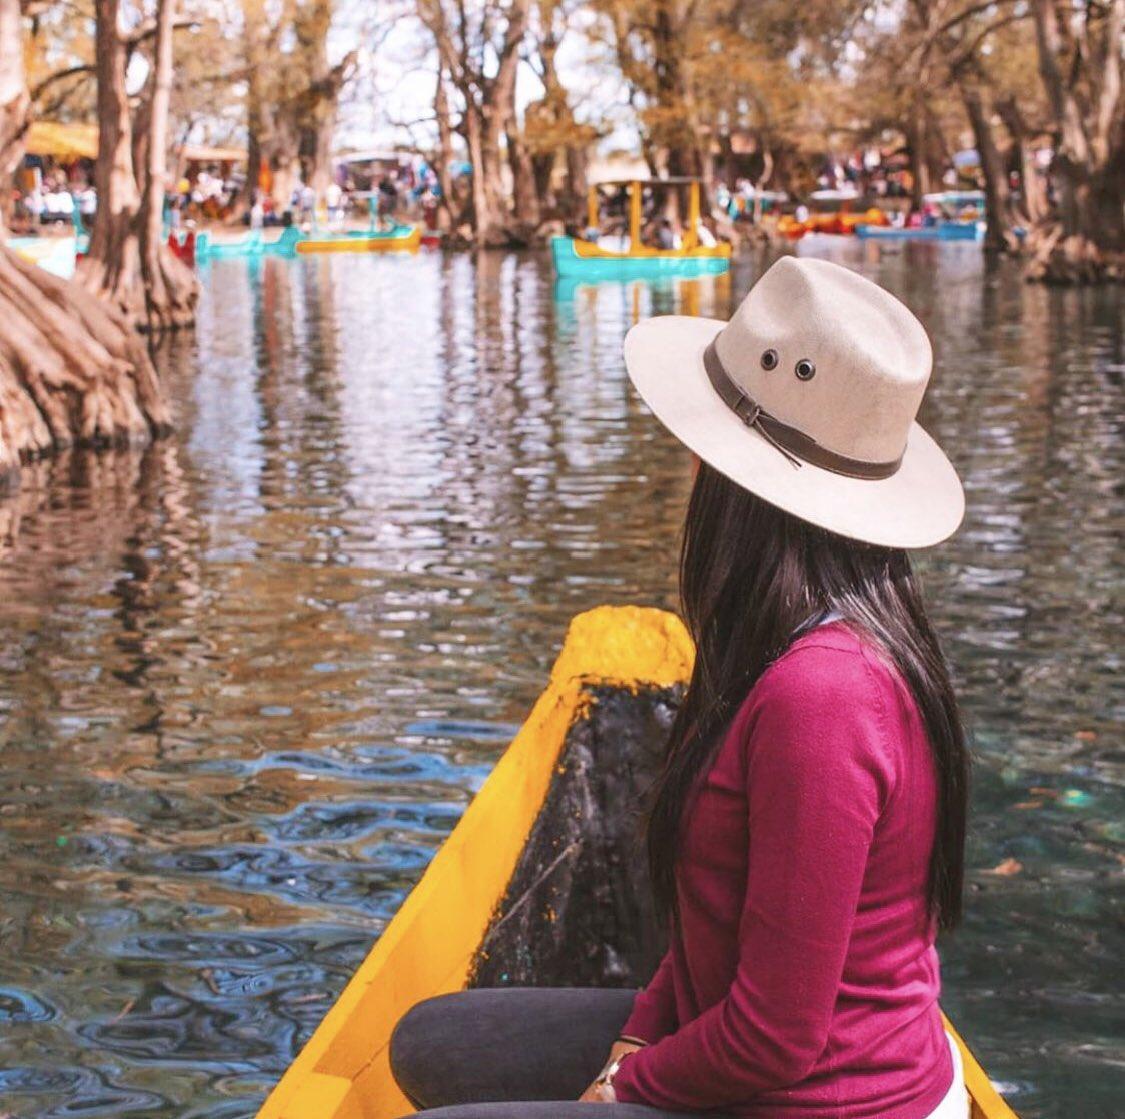 Lago de Camecuaro 🌳 📸@el.oscar.d  ••• #Michoacan #LagodeCamecuaro #Lago #VisitaMorelia #AMORelia #Reserva #CasaAura #Hospedate #Airbnb #AirbnbExperience https://t.co/NnXICvvKsy